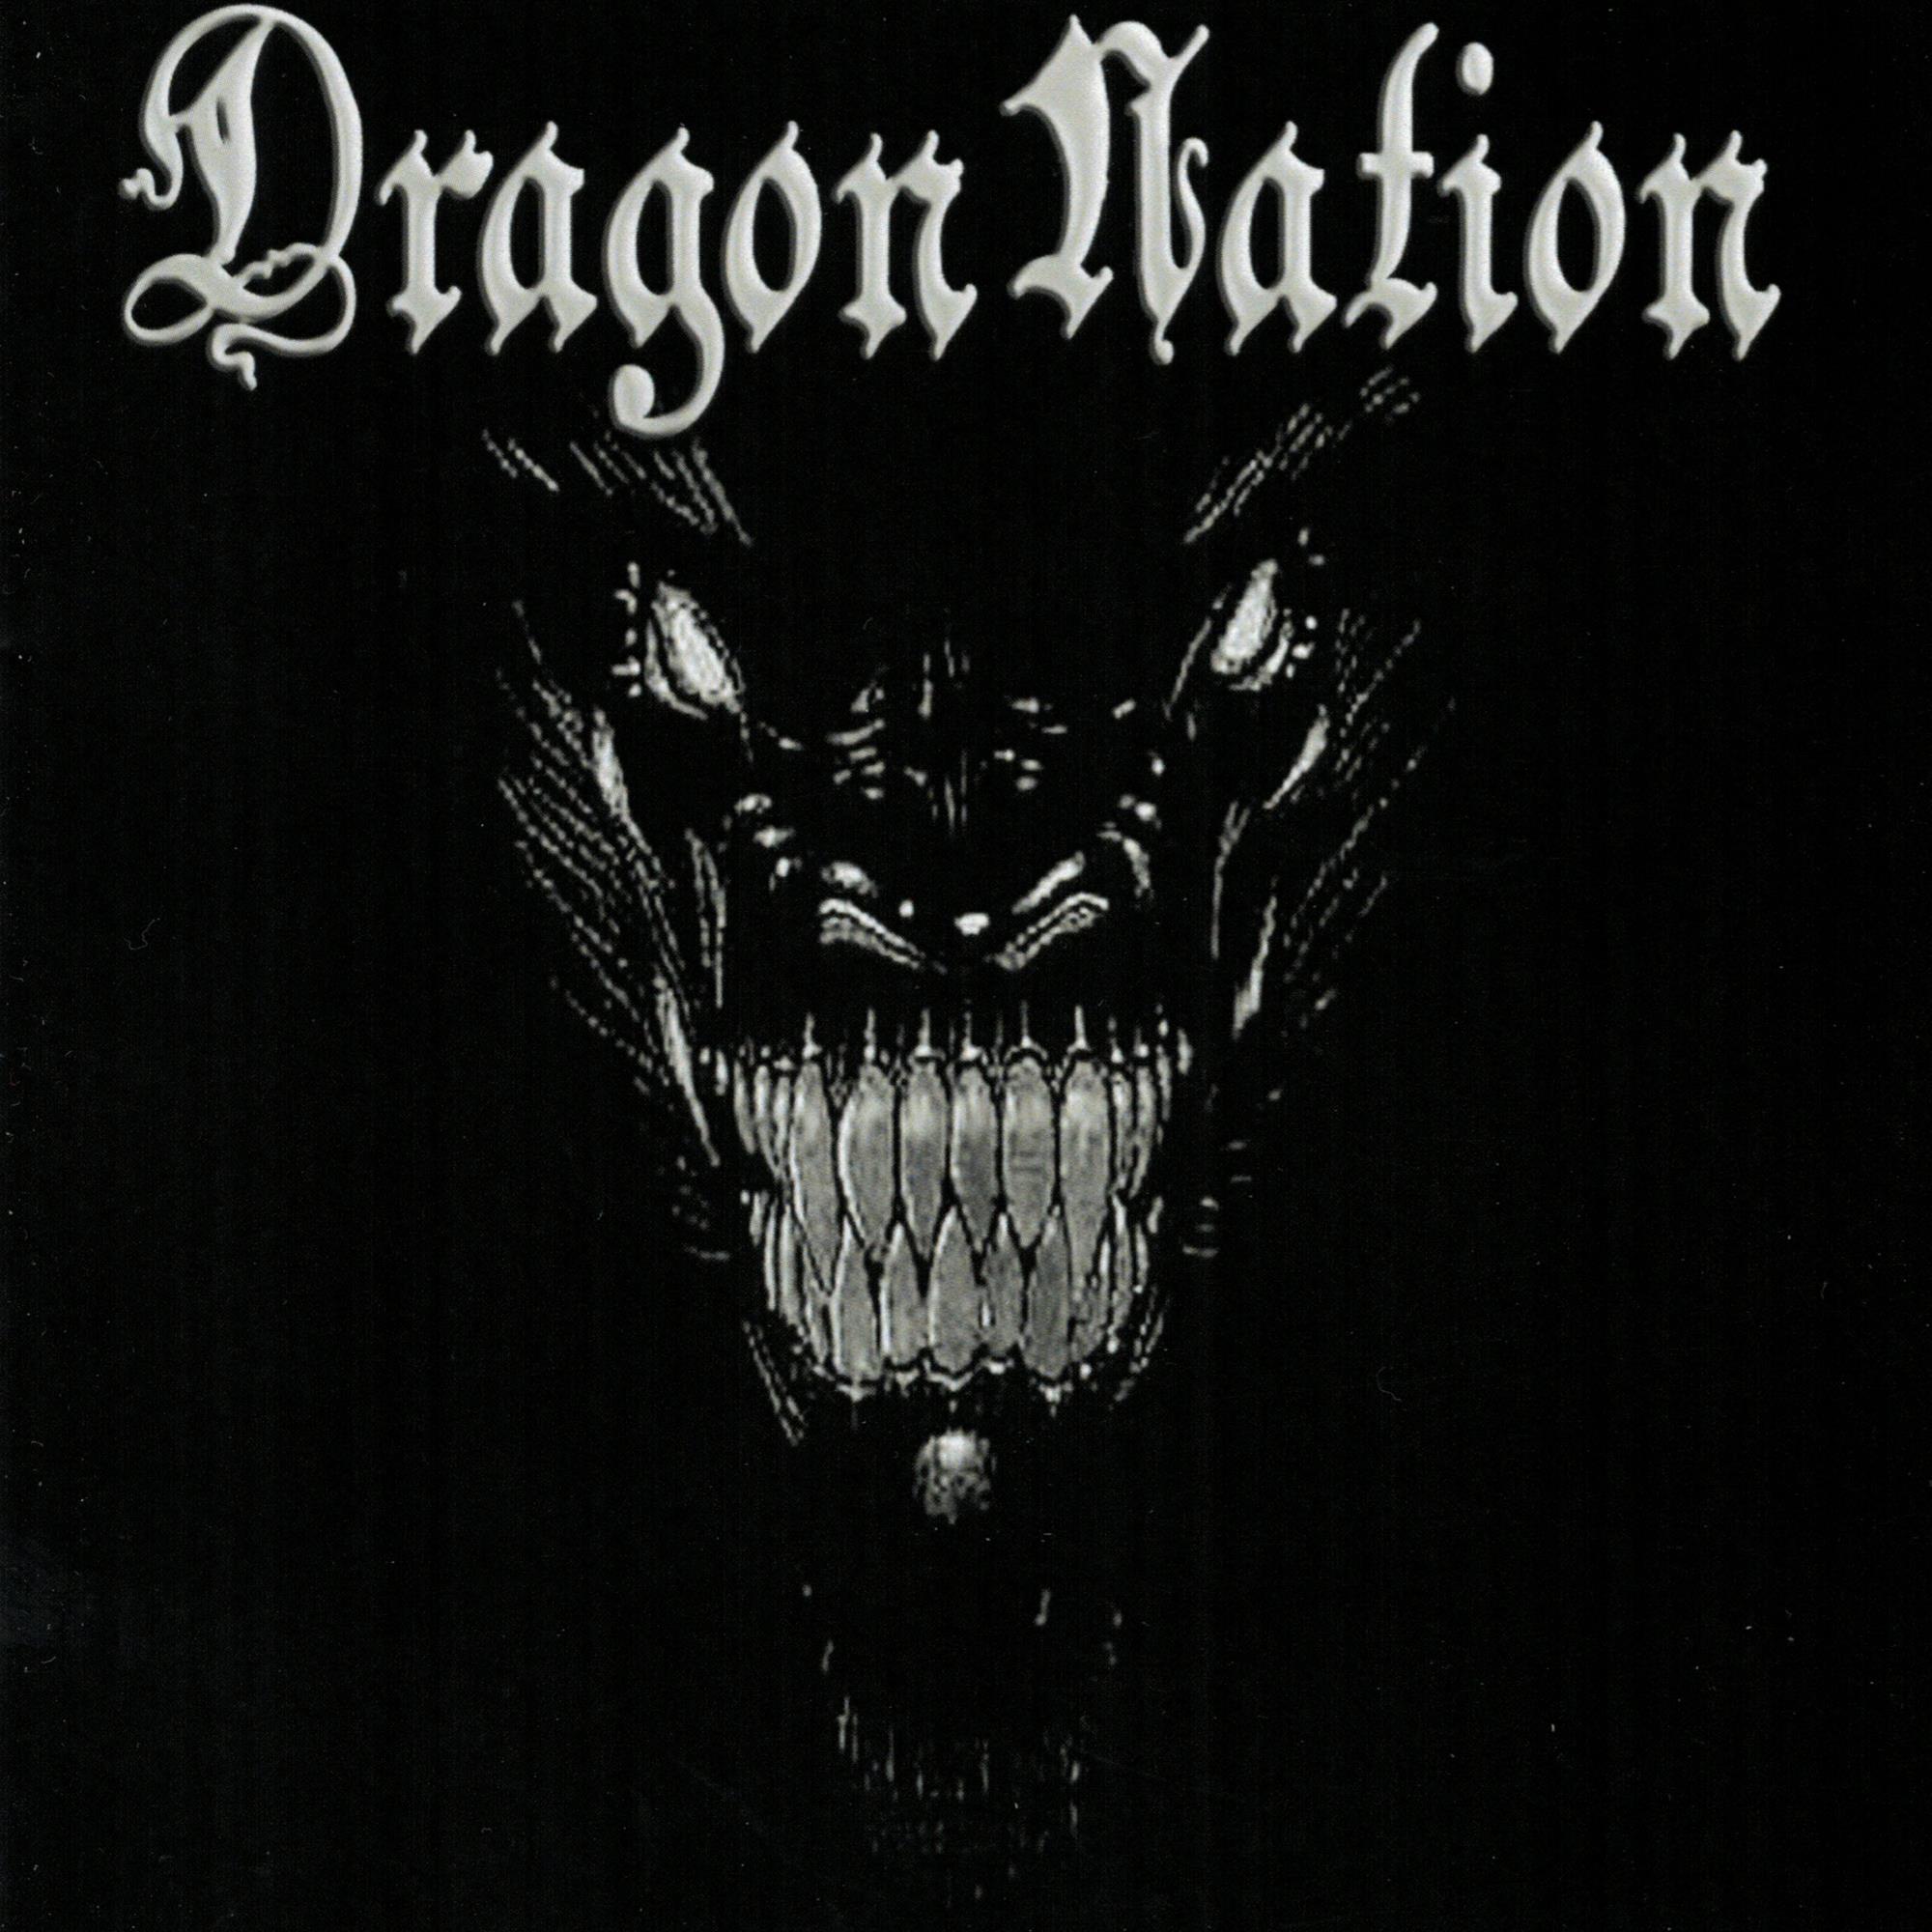 Dragon Nation CD